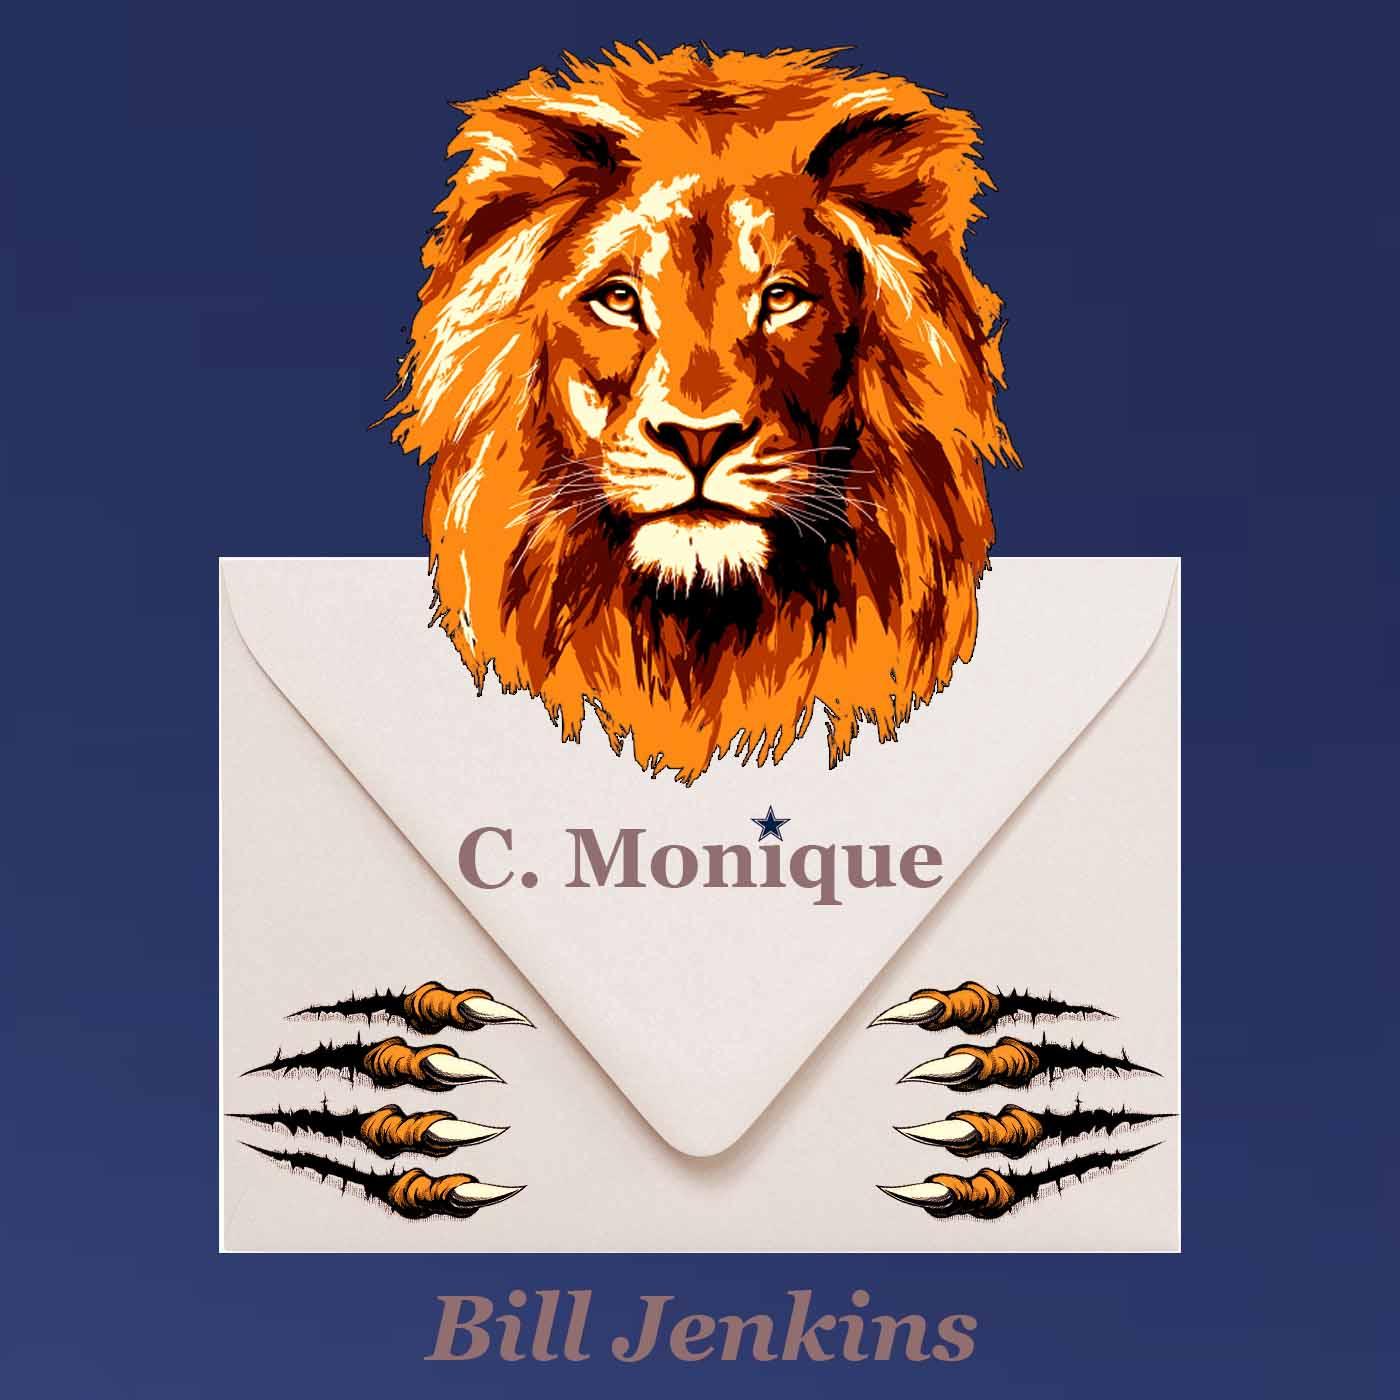 Bill Jenkins C. Monique